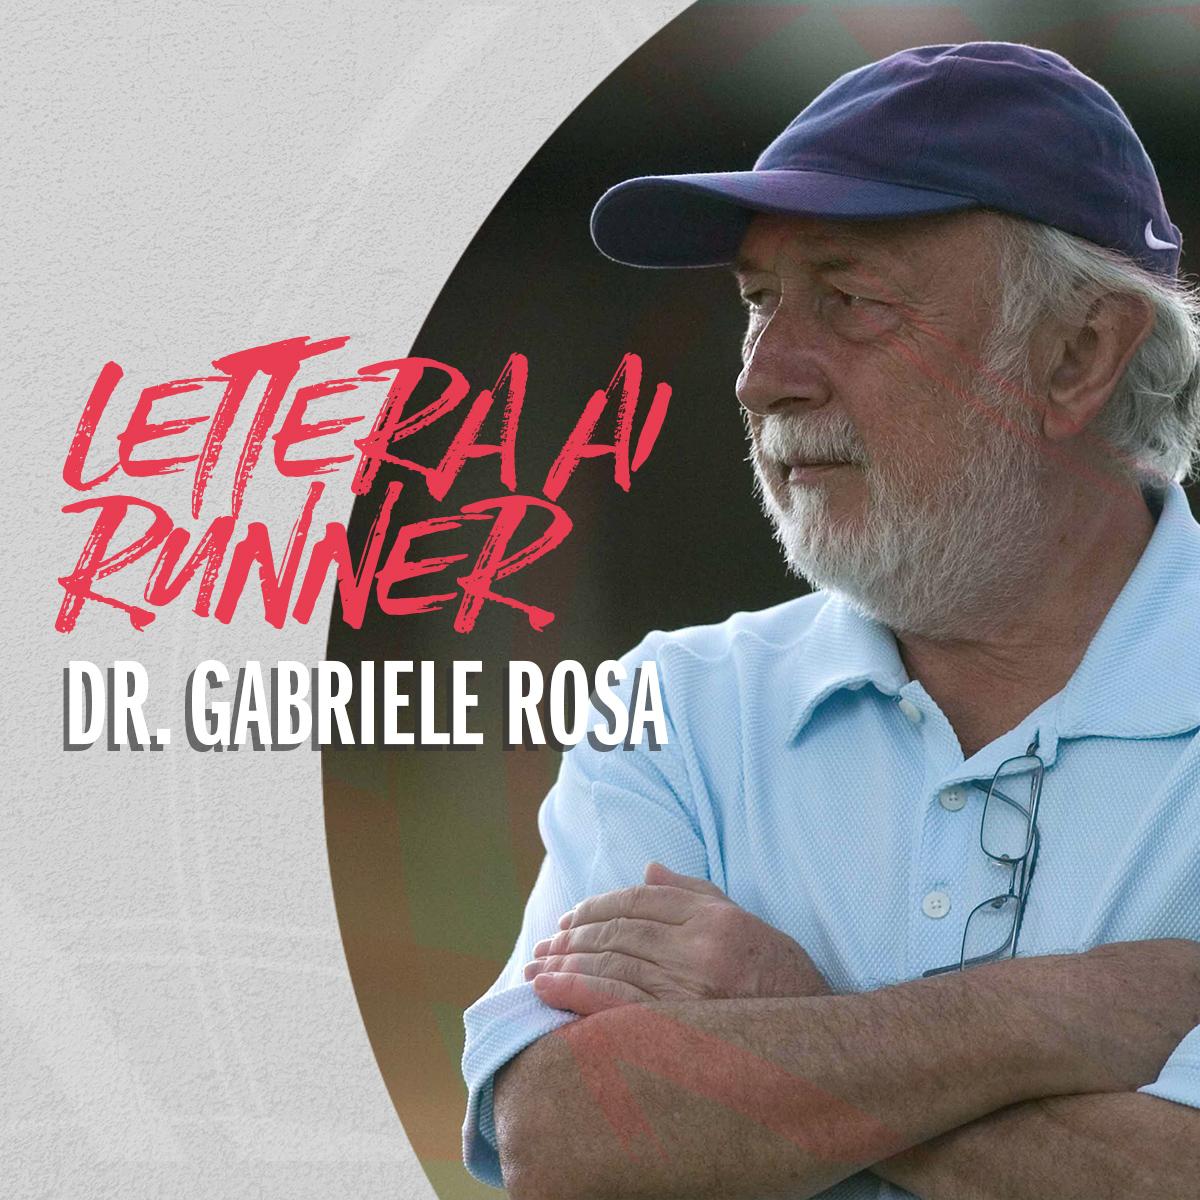 dr-gabriele-rosa-lettera-ai-runner-rosa-associati-quadrato 2